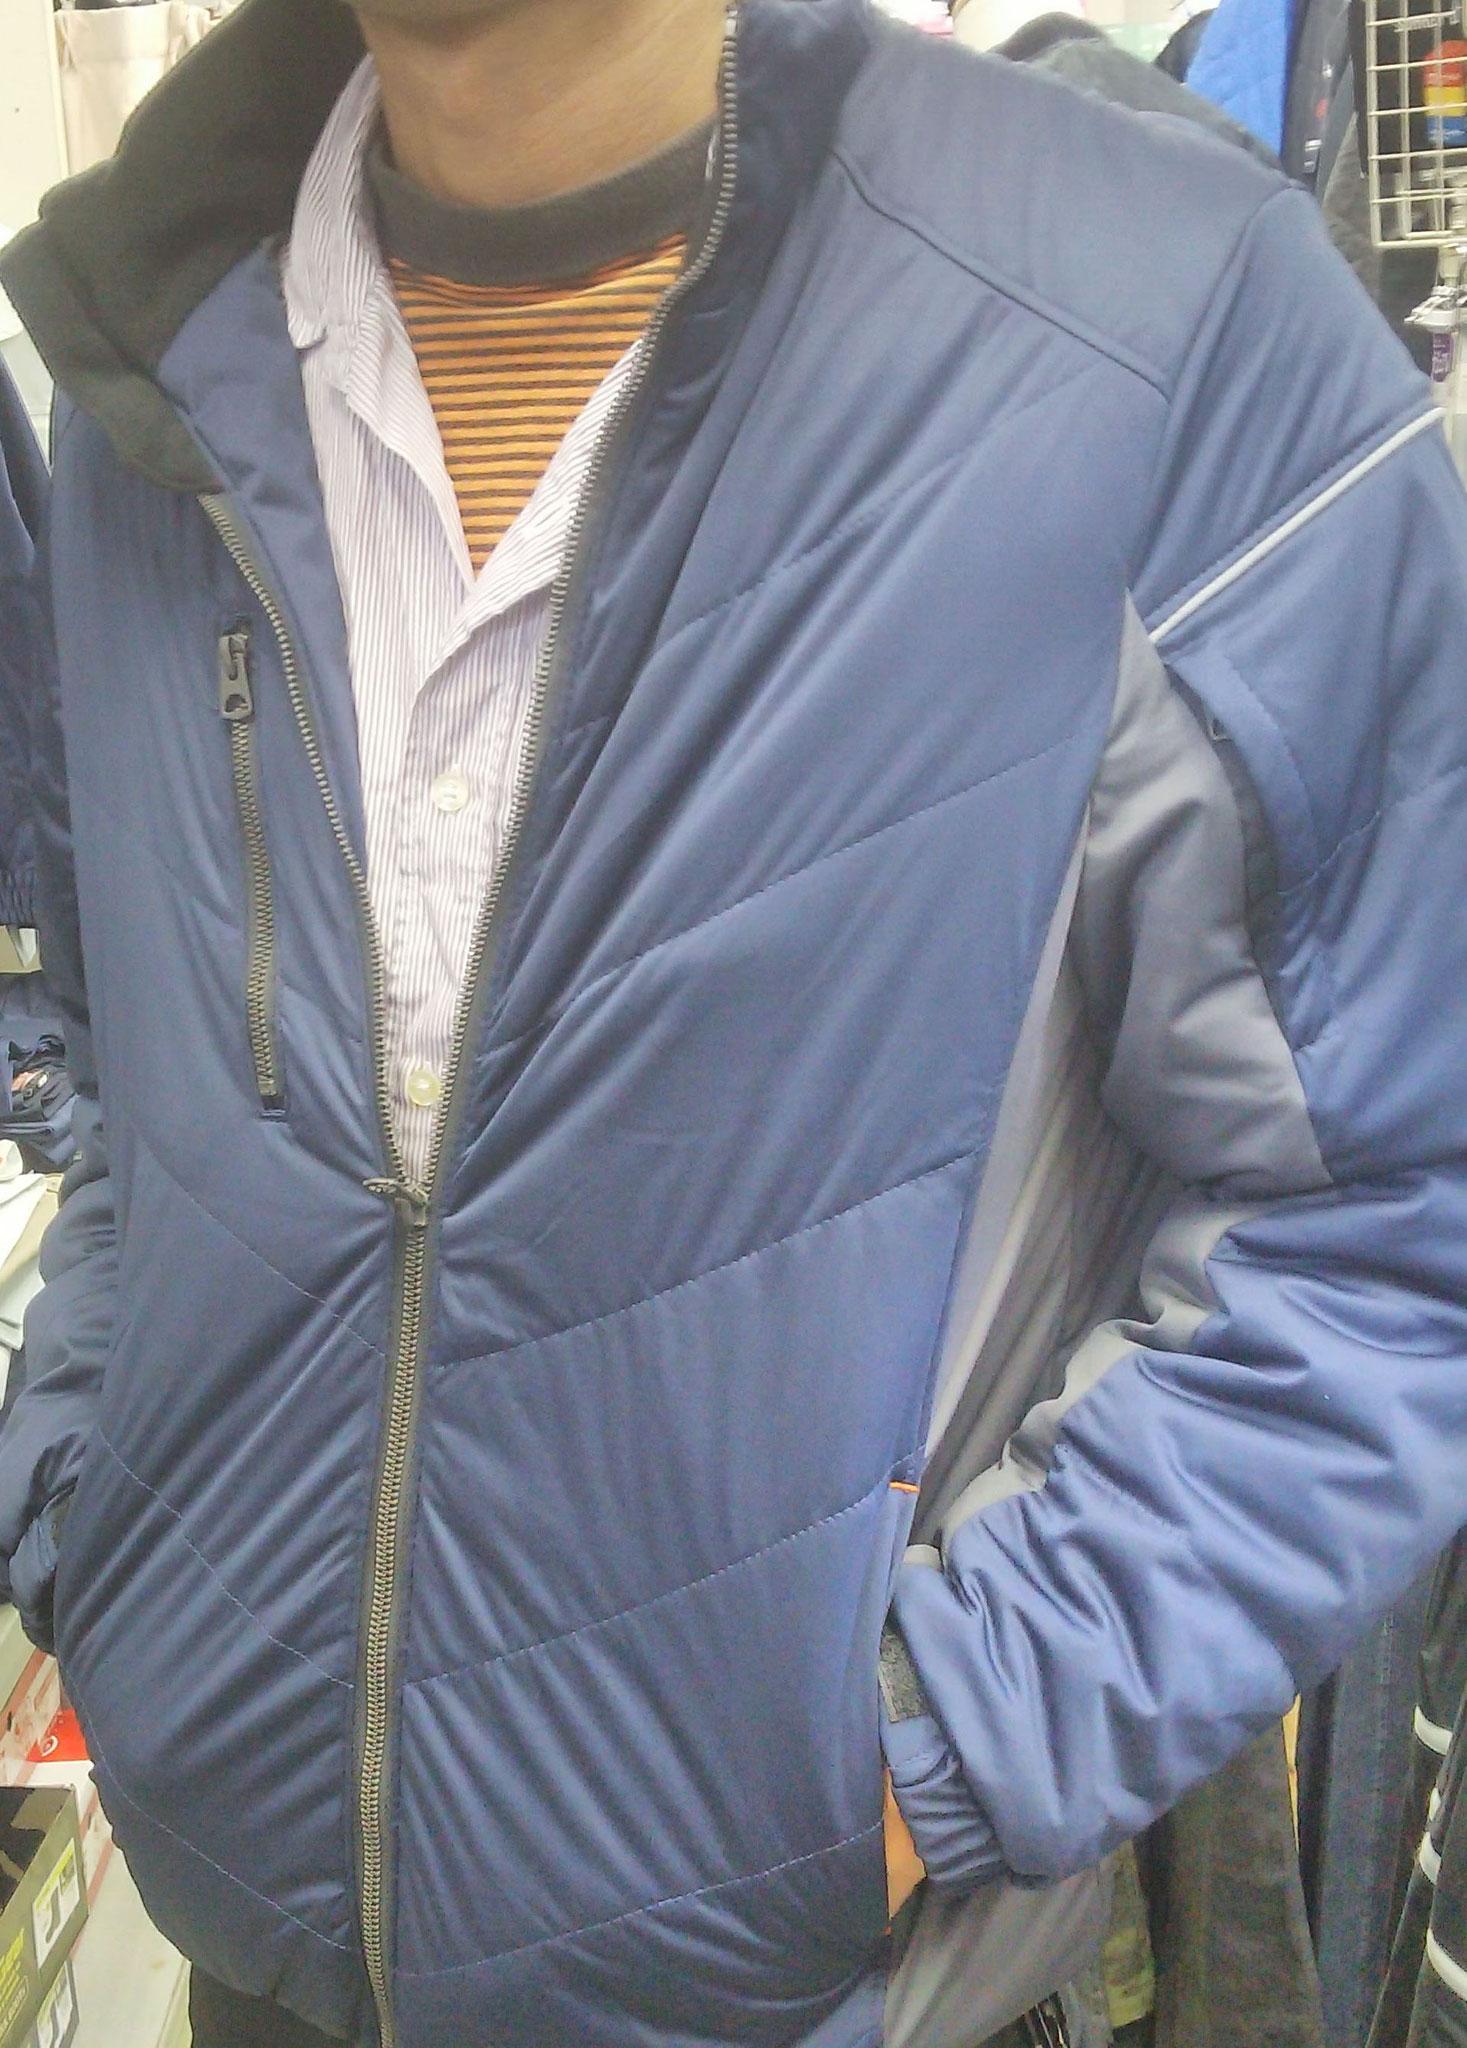 G.GROUND 44603 防風ブルゾン ¥2,990(税込) 軽量なのに、しっかり防風するブルゾン!!